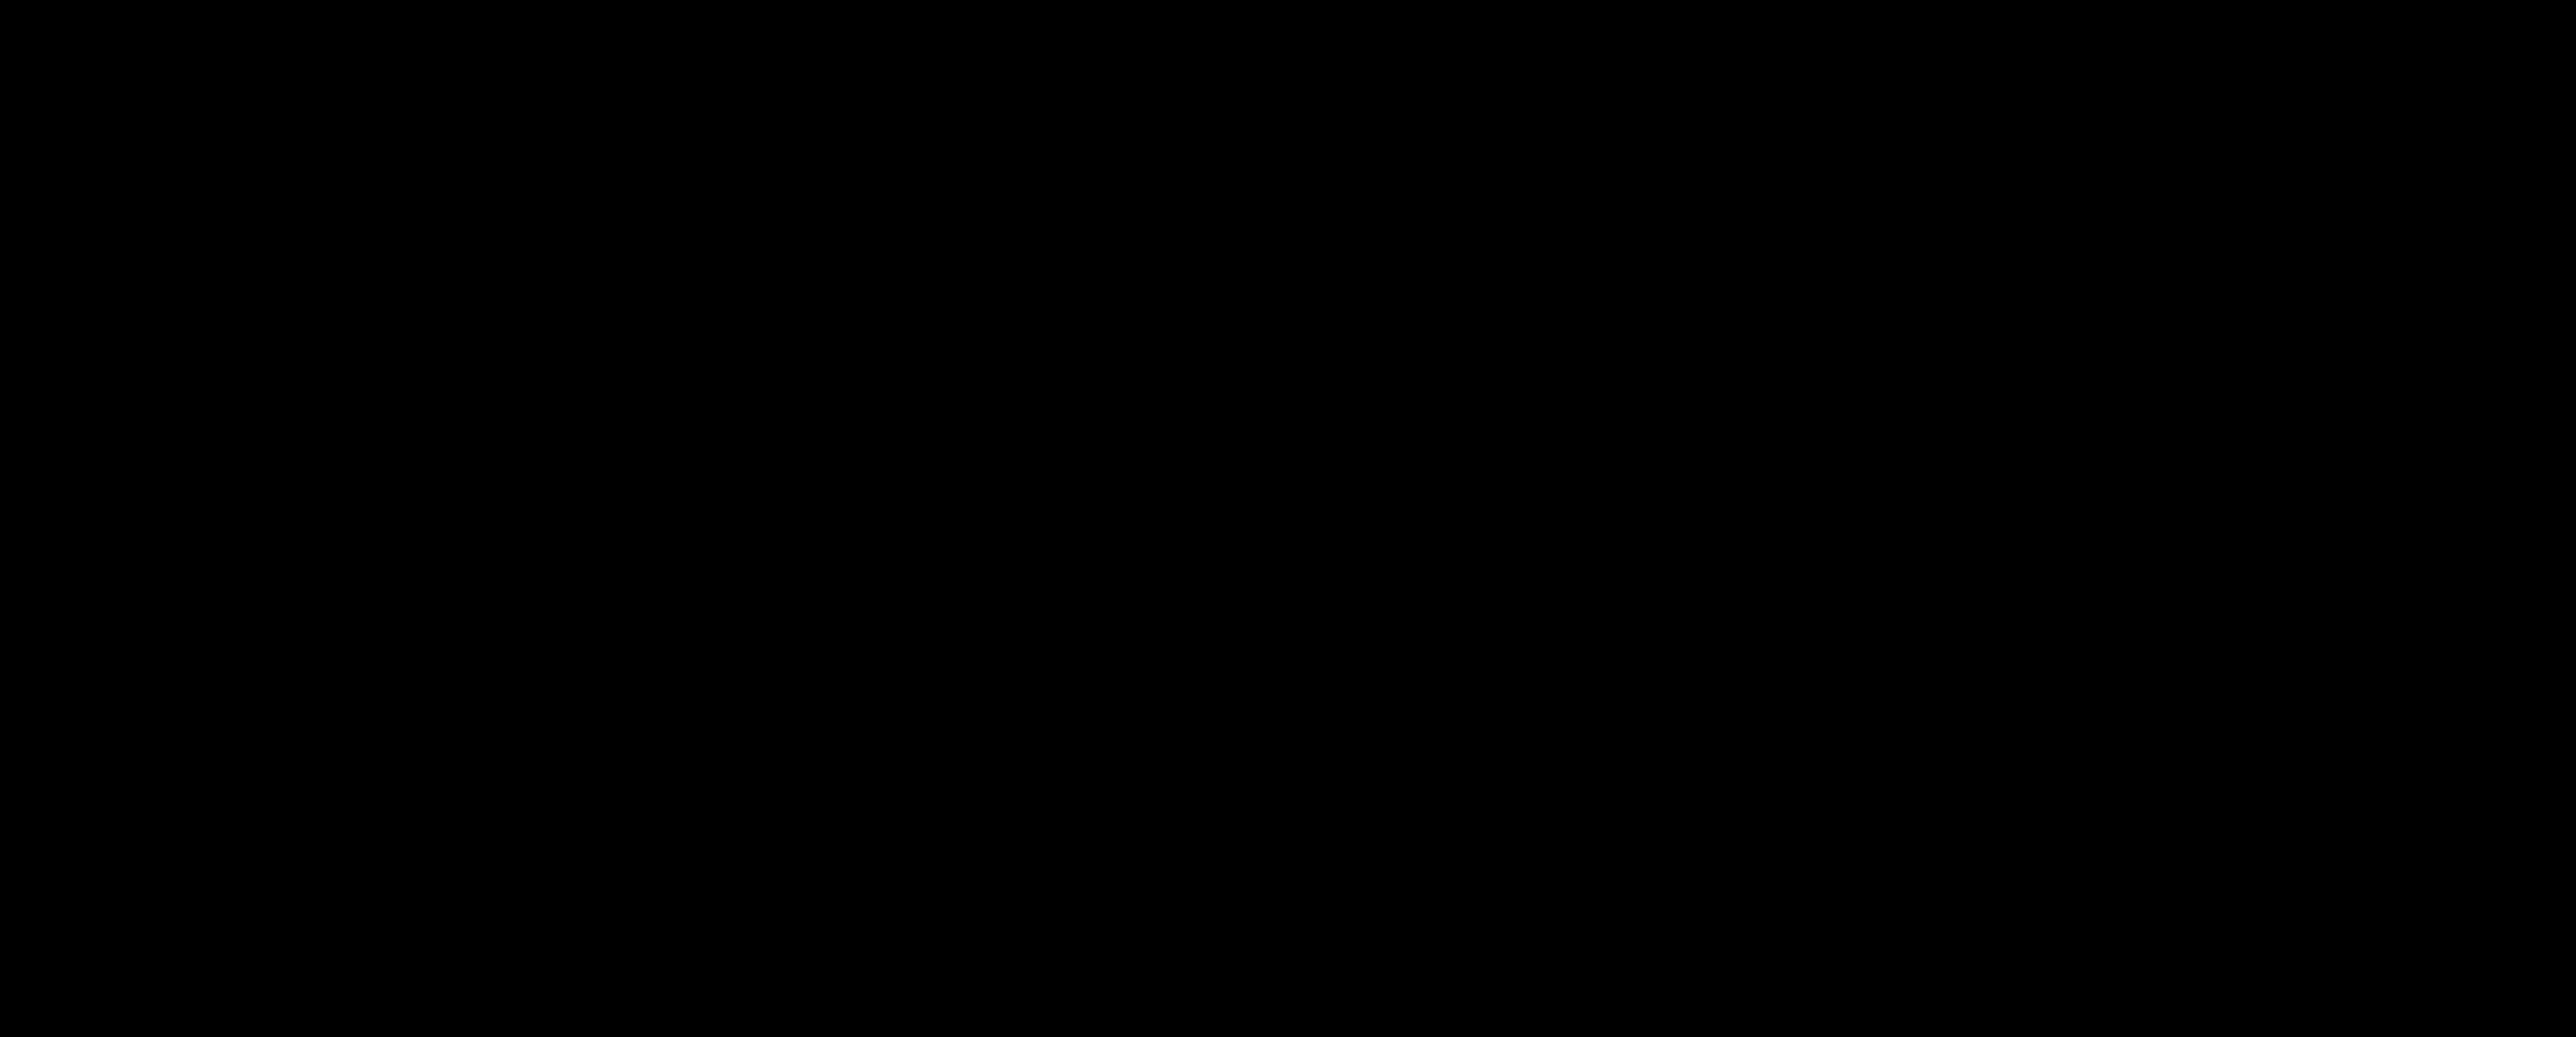 AVG wordmark